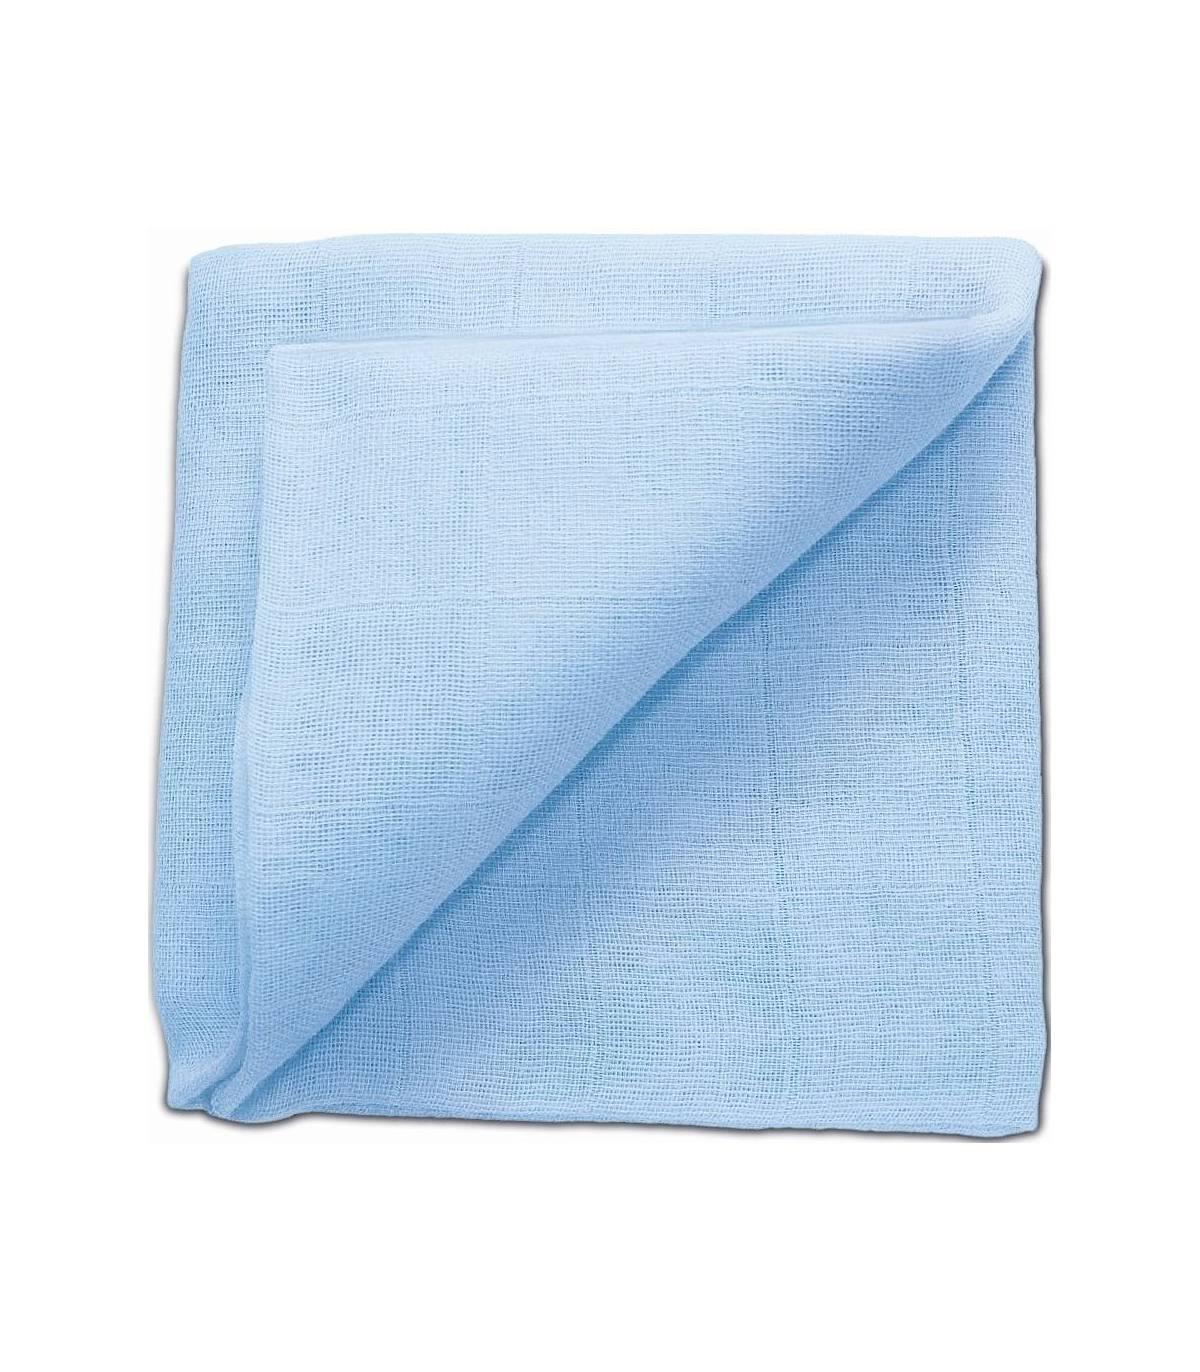 Zewi Bébé-Jou Baby Gaze UNI Bunt 60x60 (Nuscheli) Light Blue